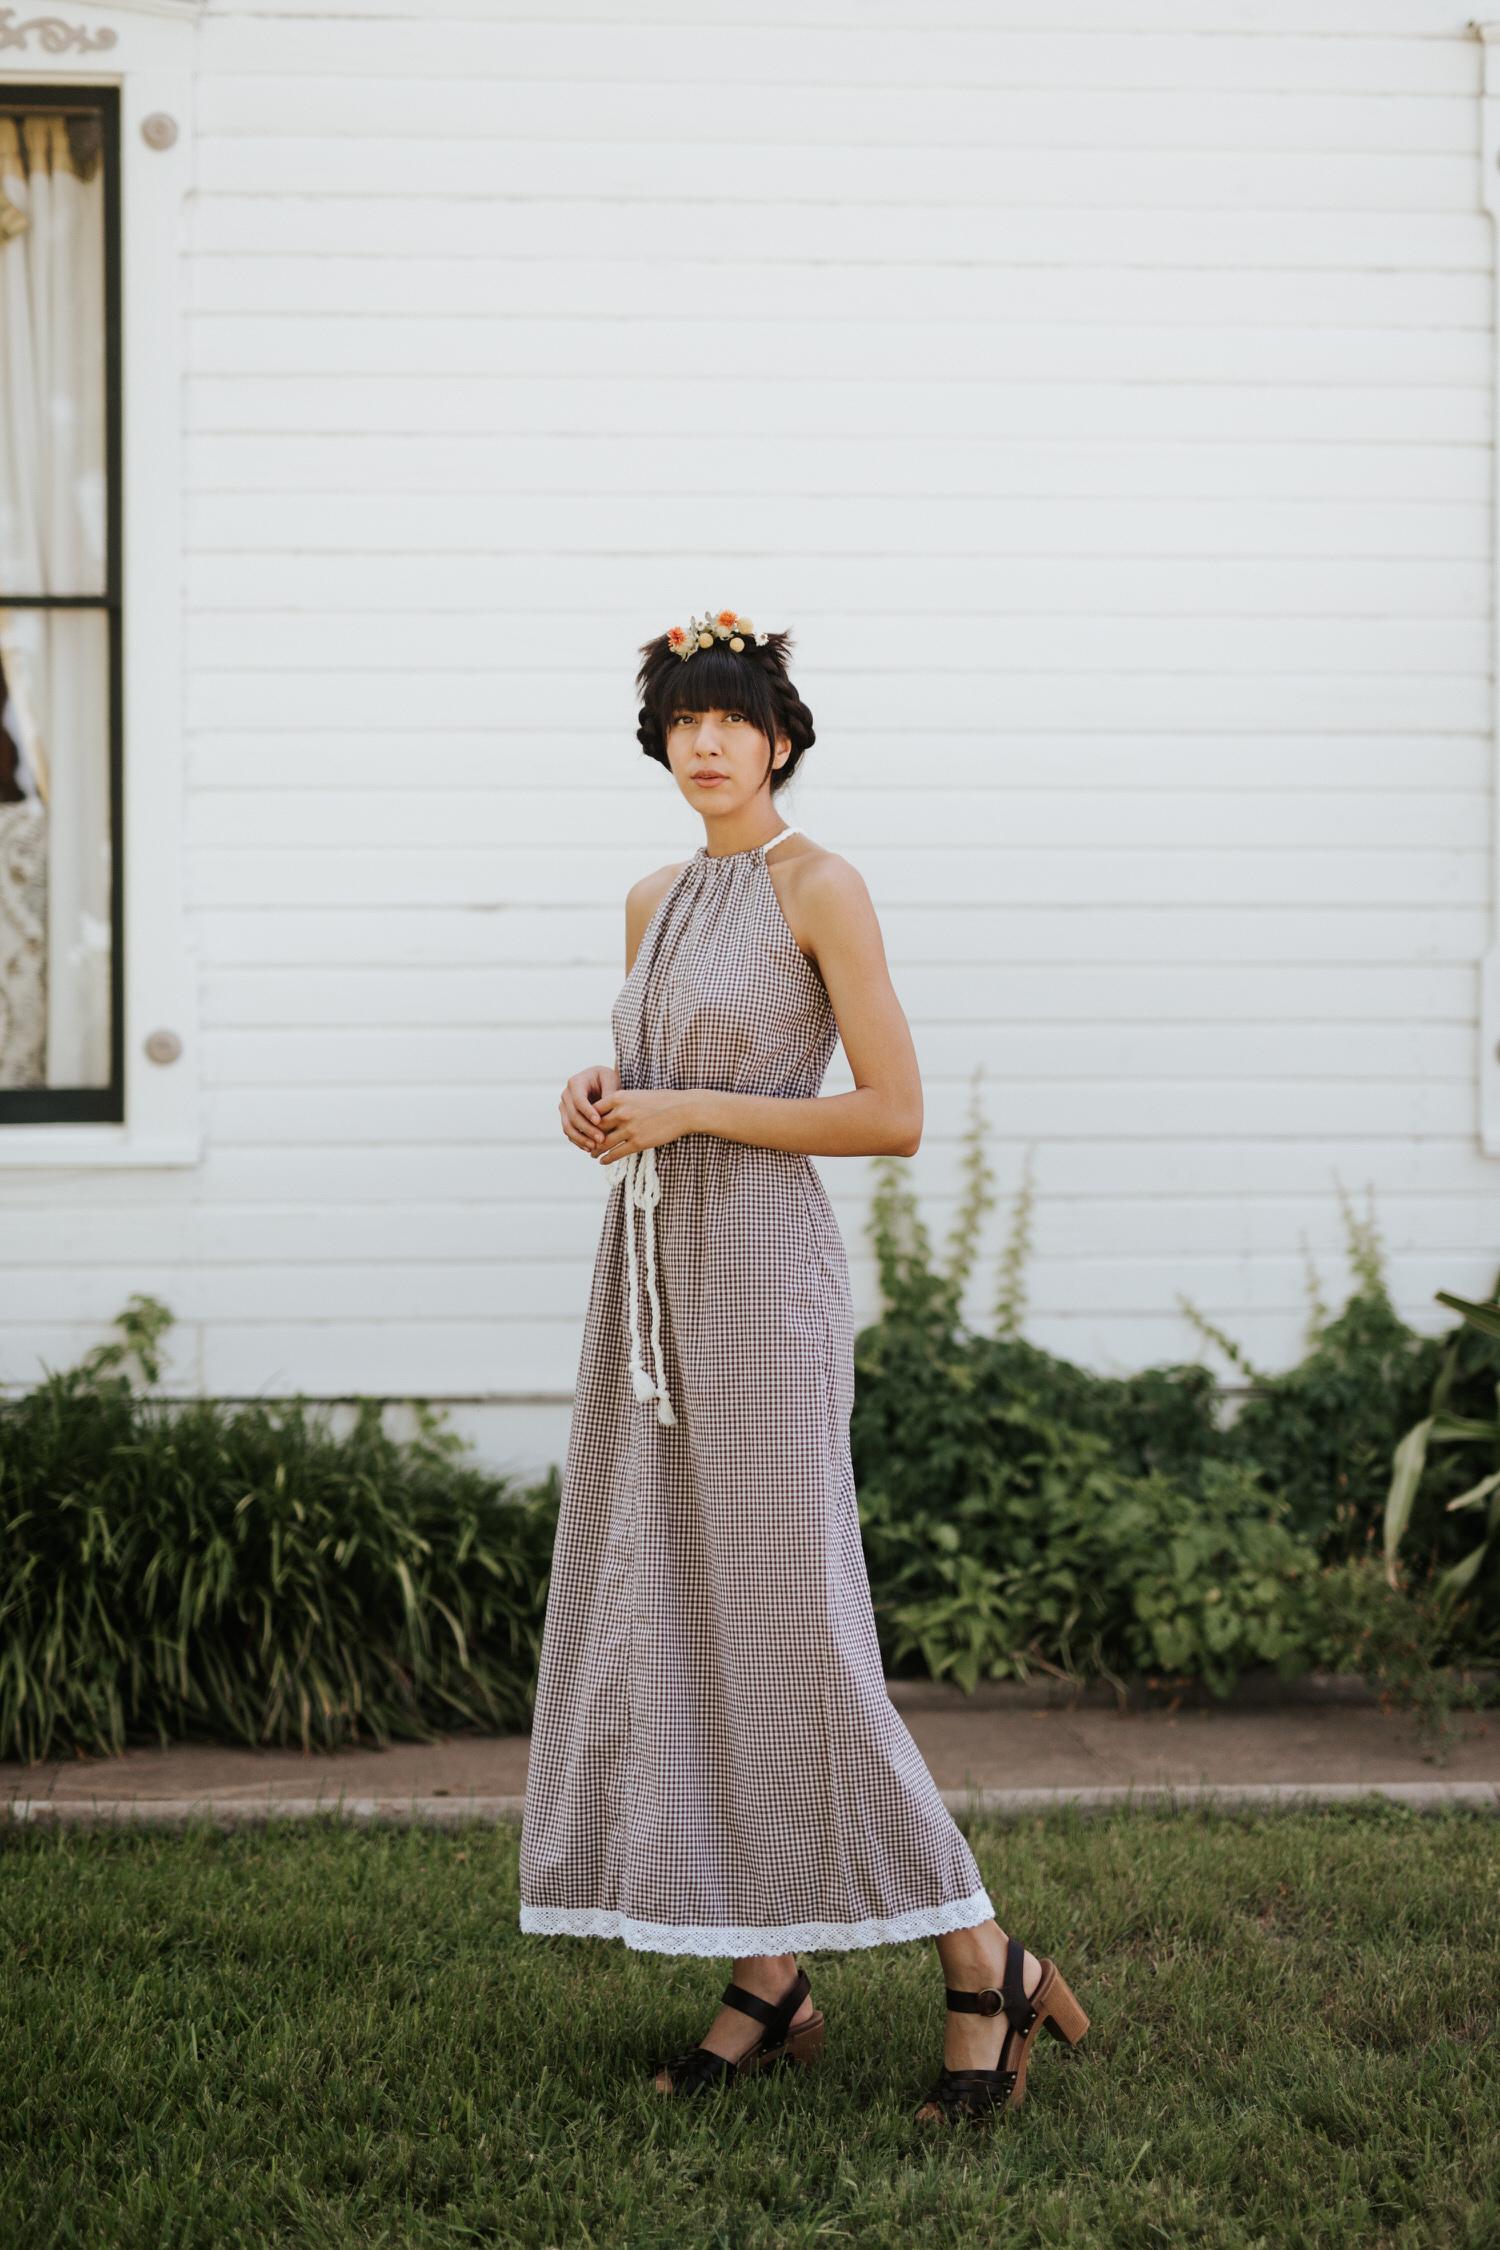 Woman in Rat Des Champs vintage dress and flower crown